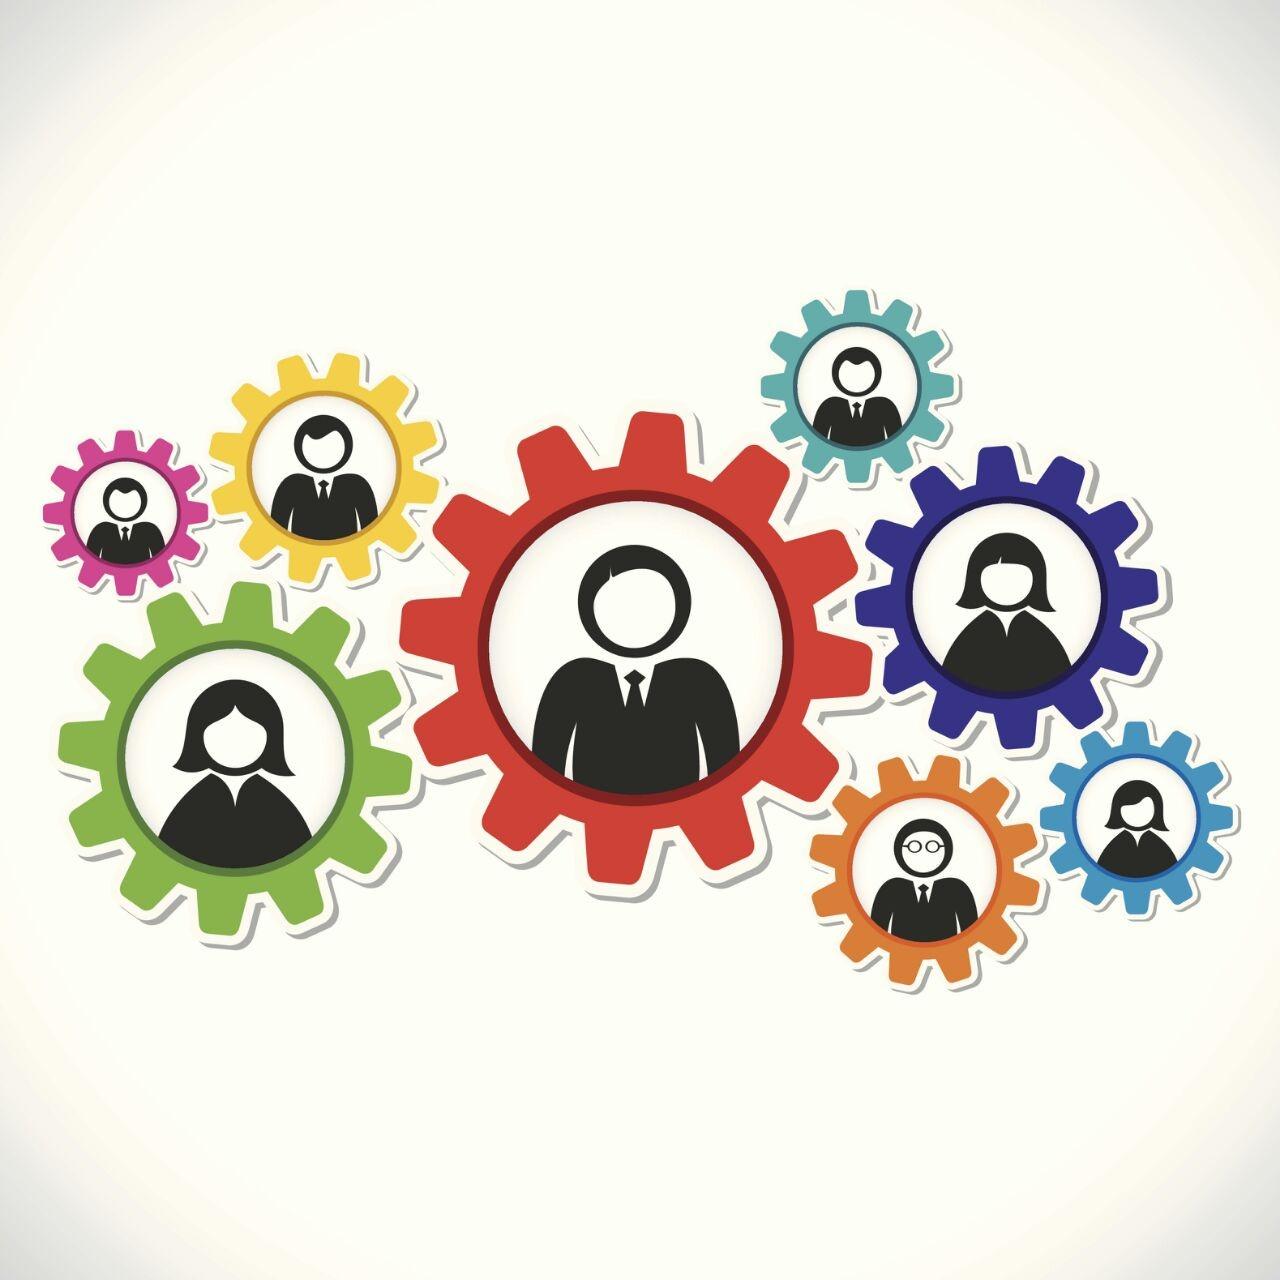 diferentes tipos de líderes